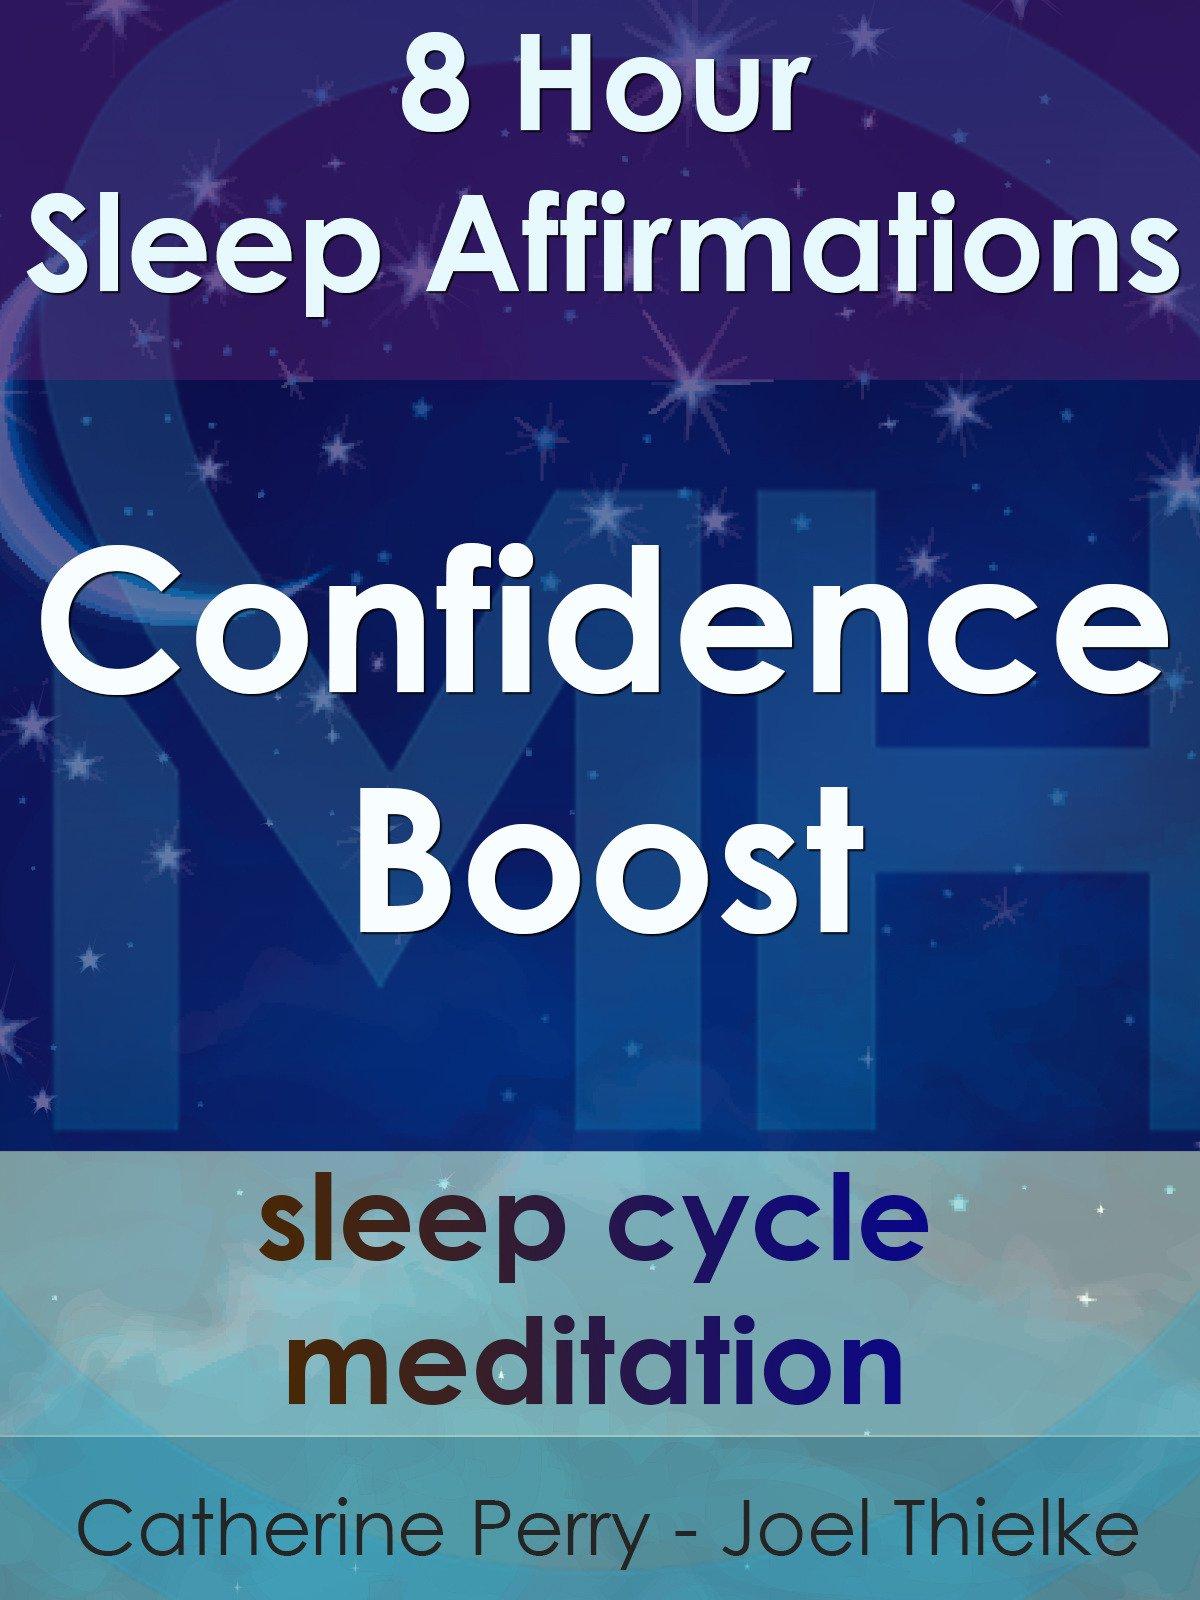 Confidence Boost Affirmations: 8 Hour Sleep Affirmations, Sleep Cycle Meditation